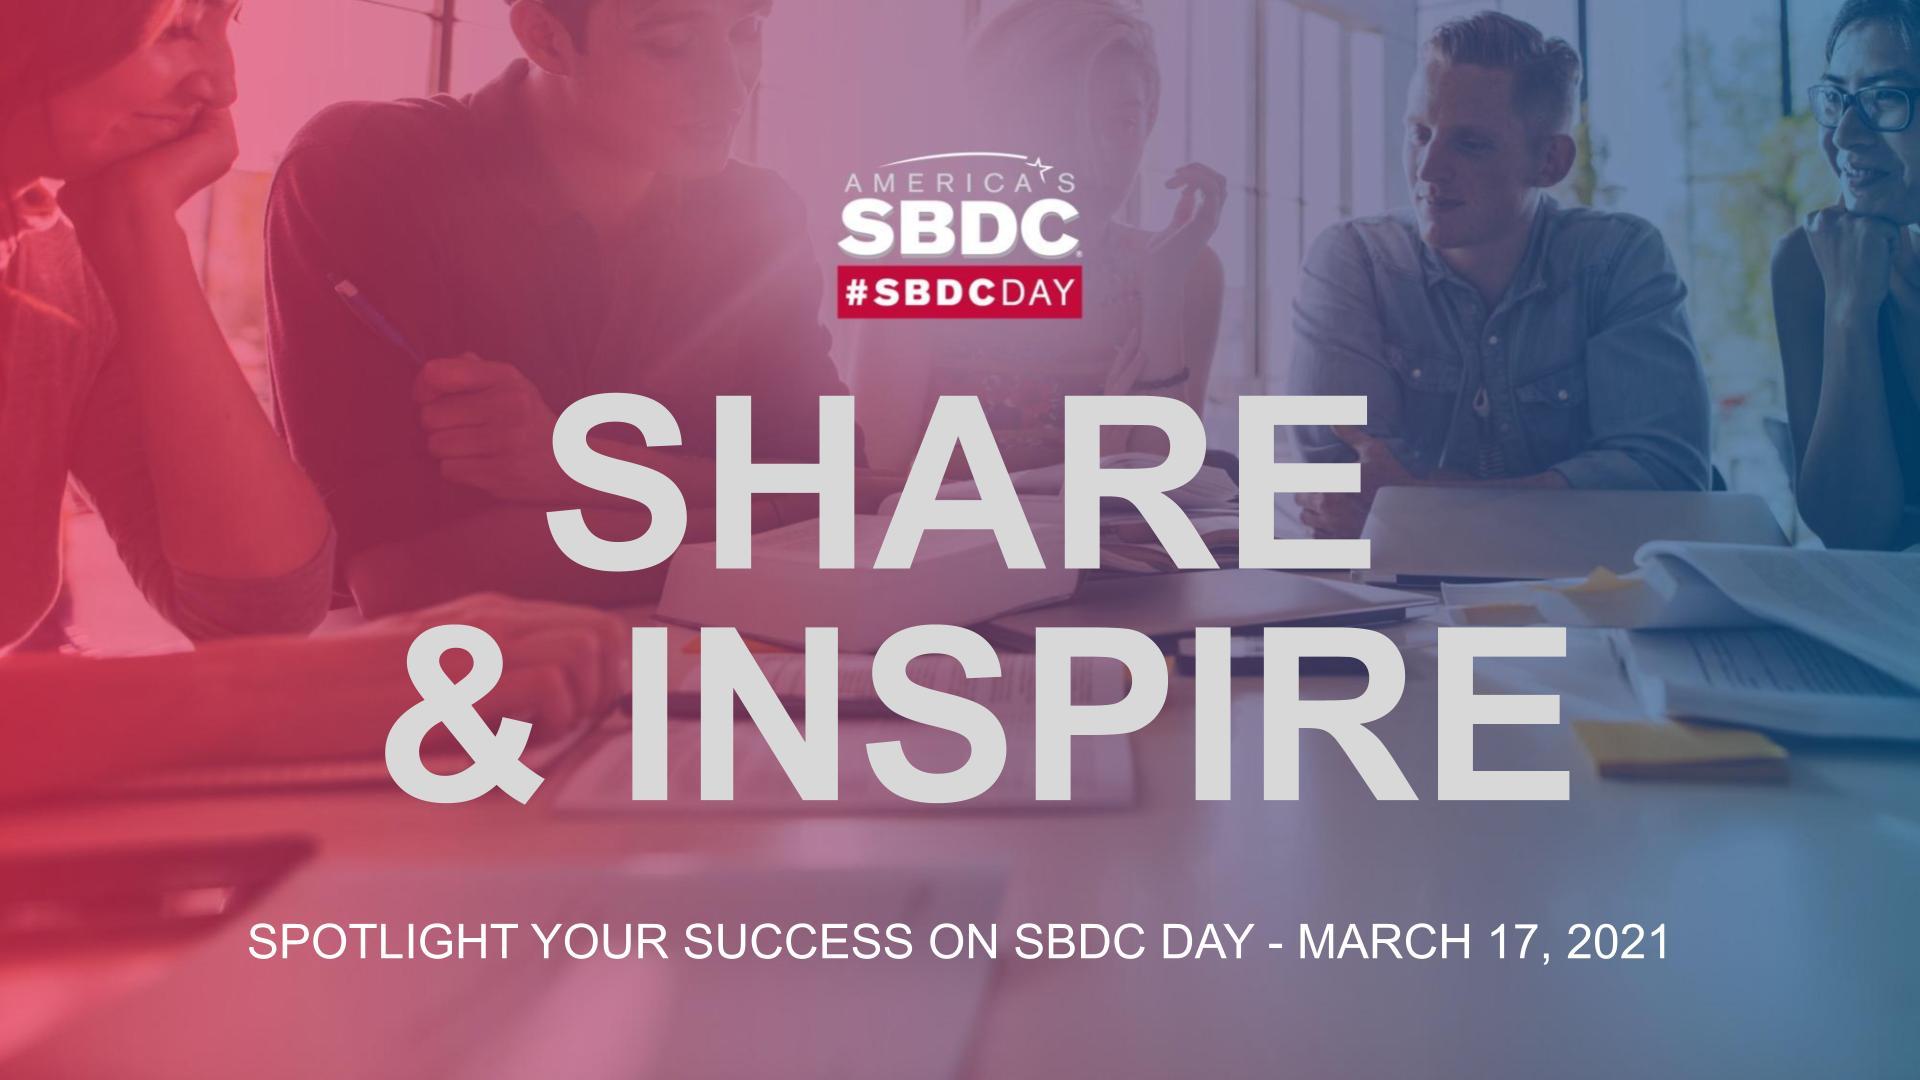 Share & Inspire